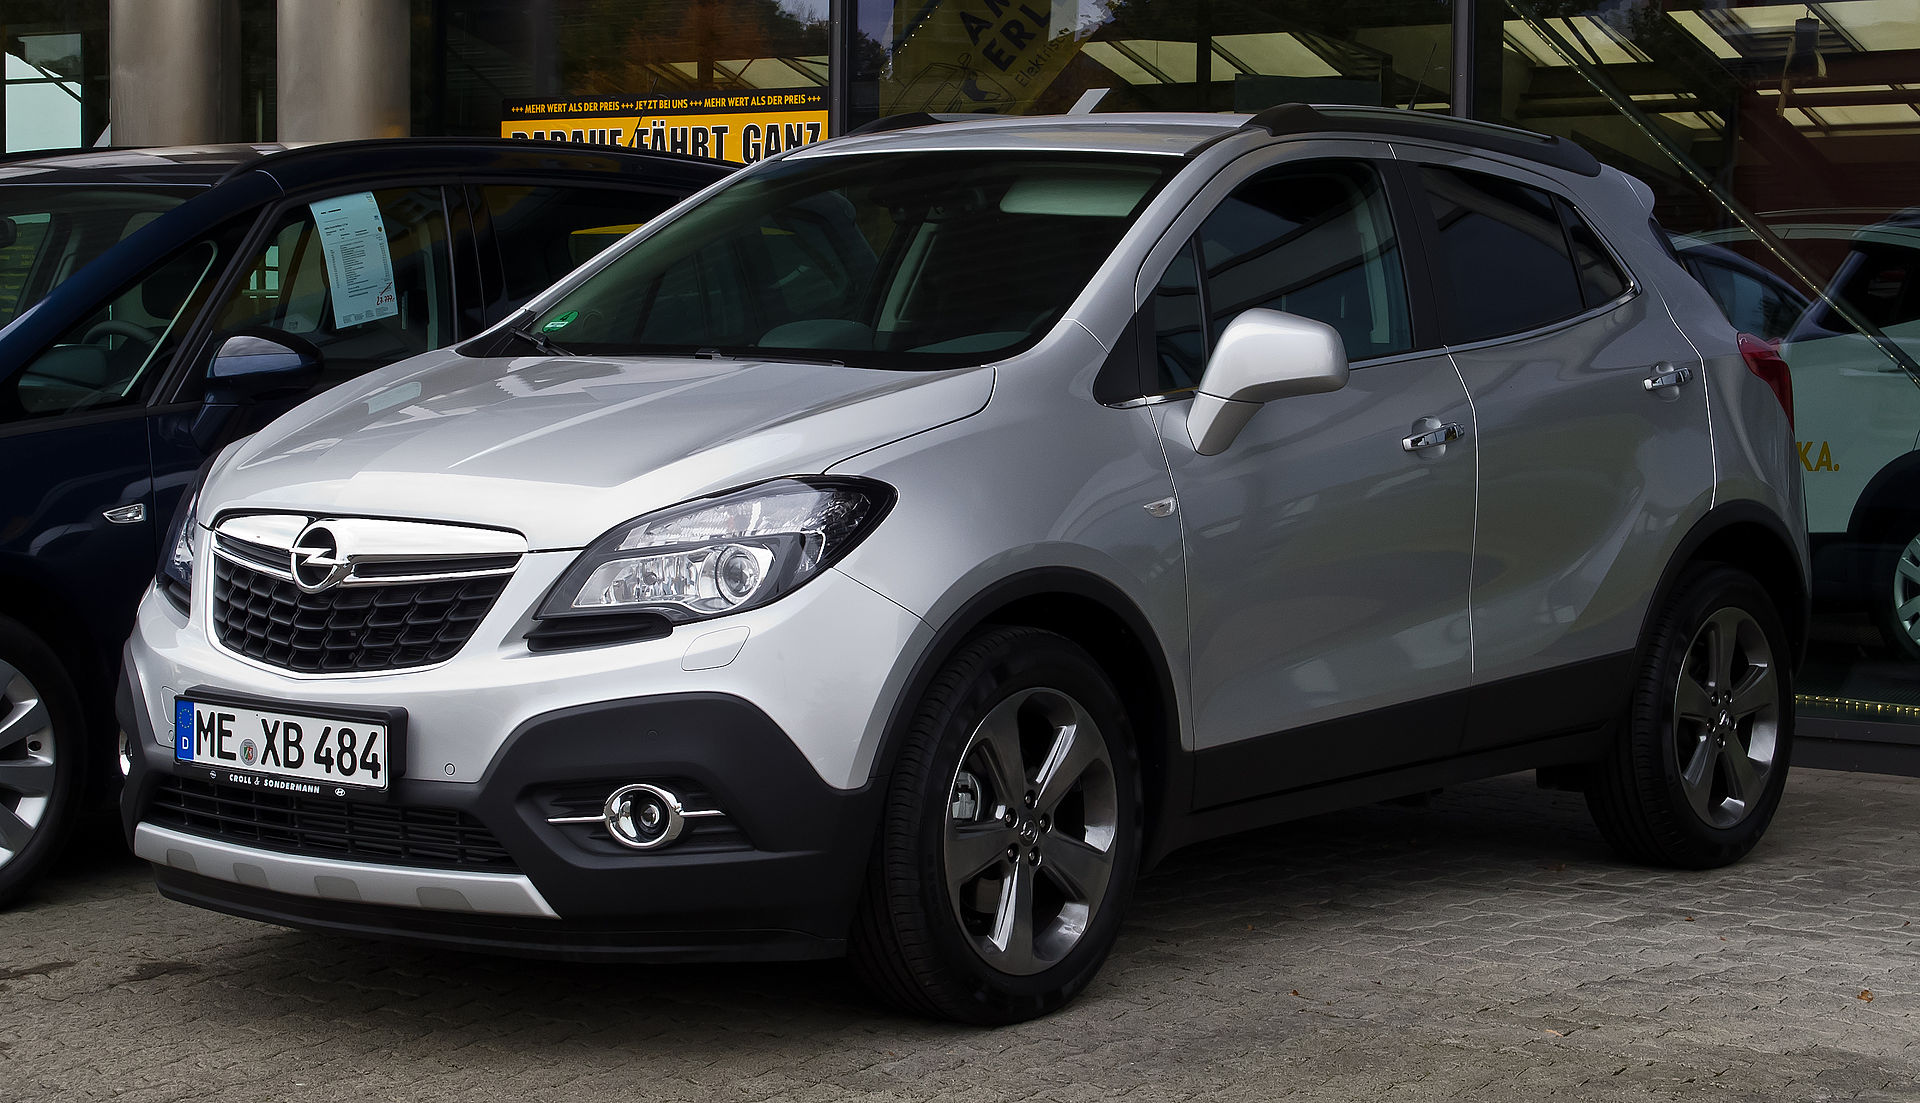 Citroen C4 Cactus Wiki >> Opel Mokka - Wikipedia